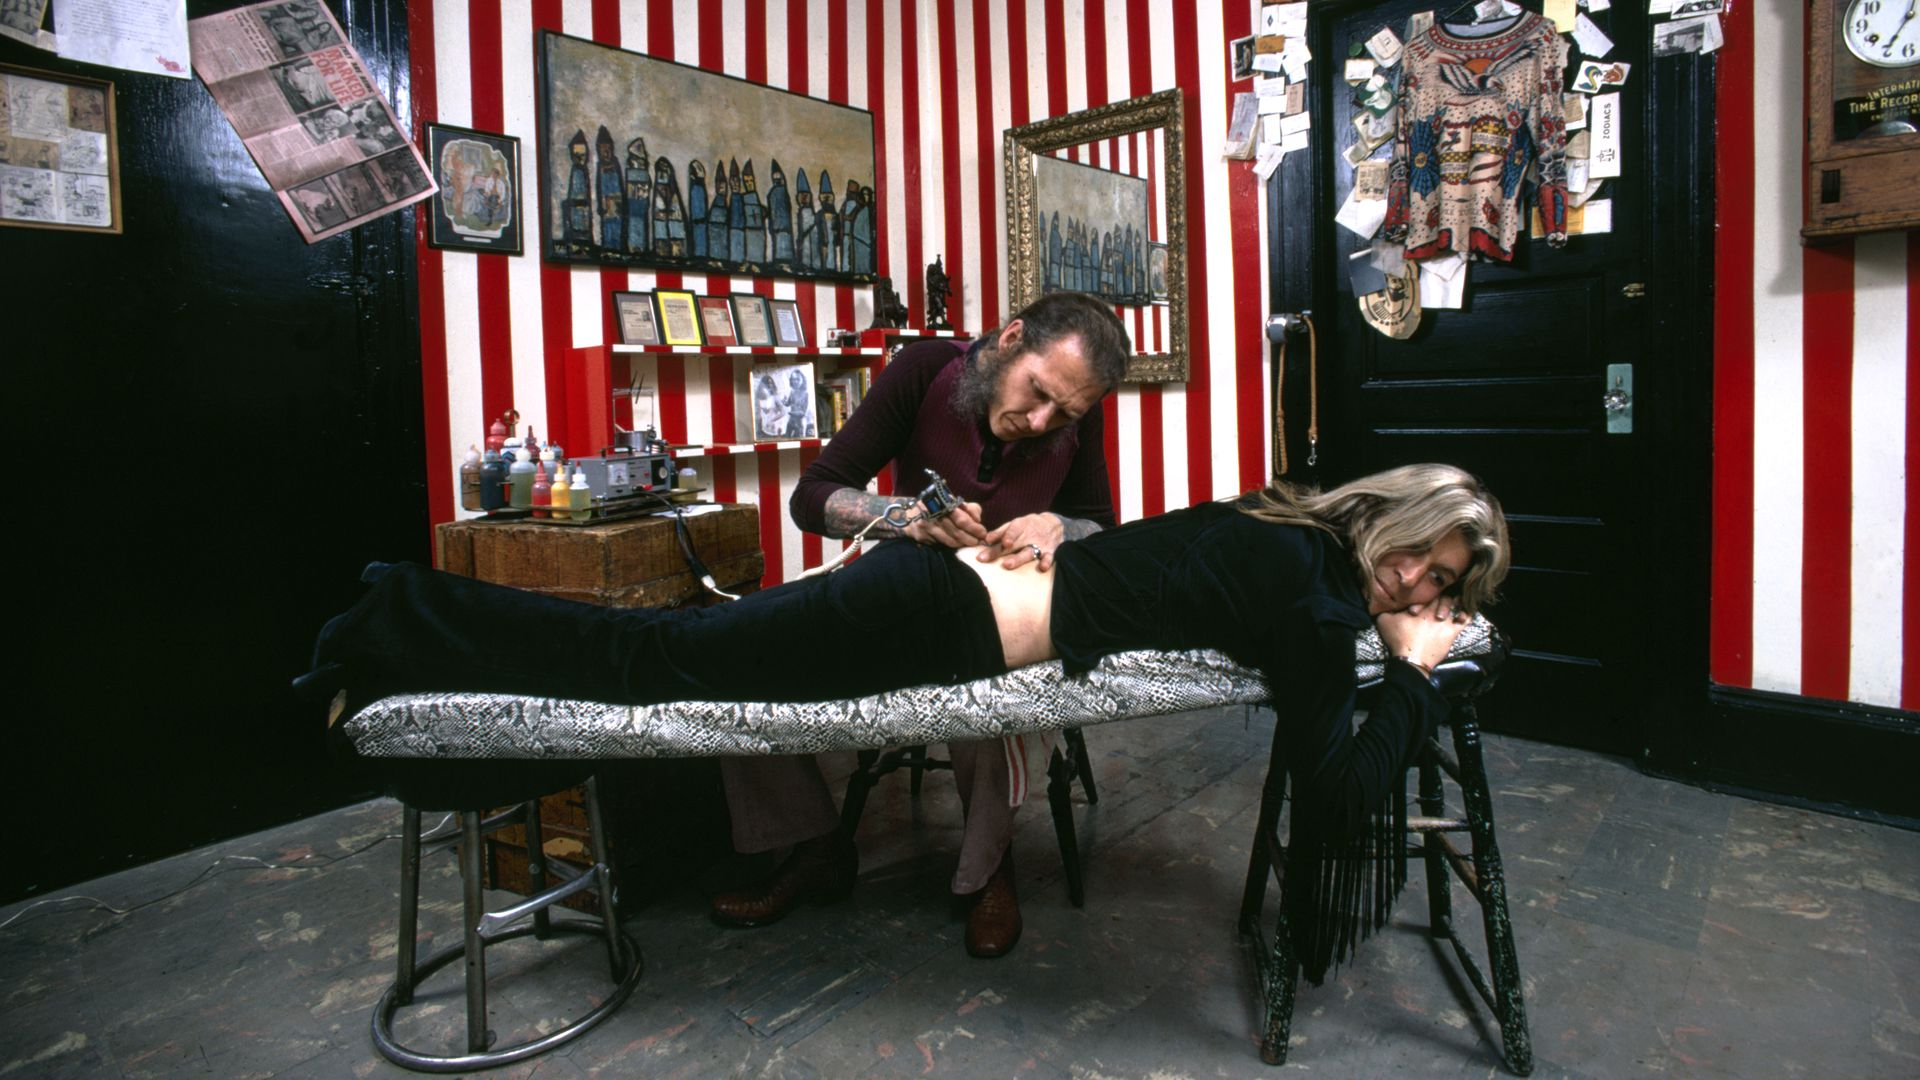 Millennials love tattoos, but their bosses may not